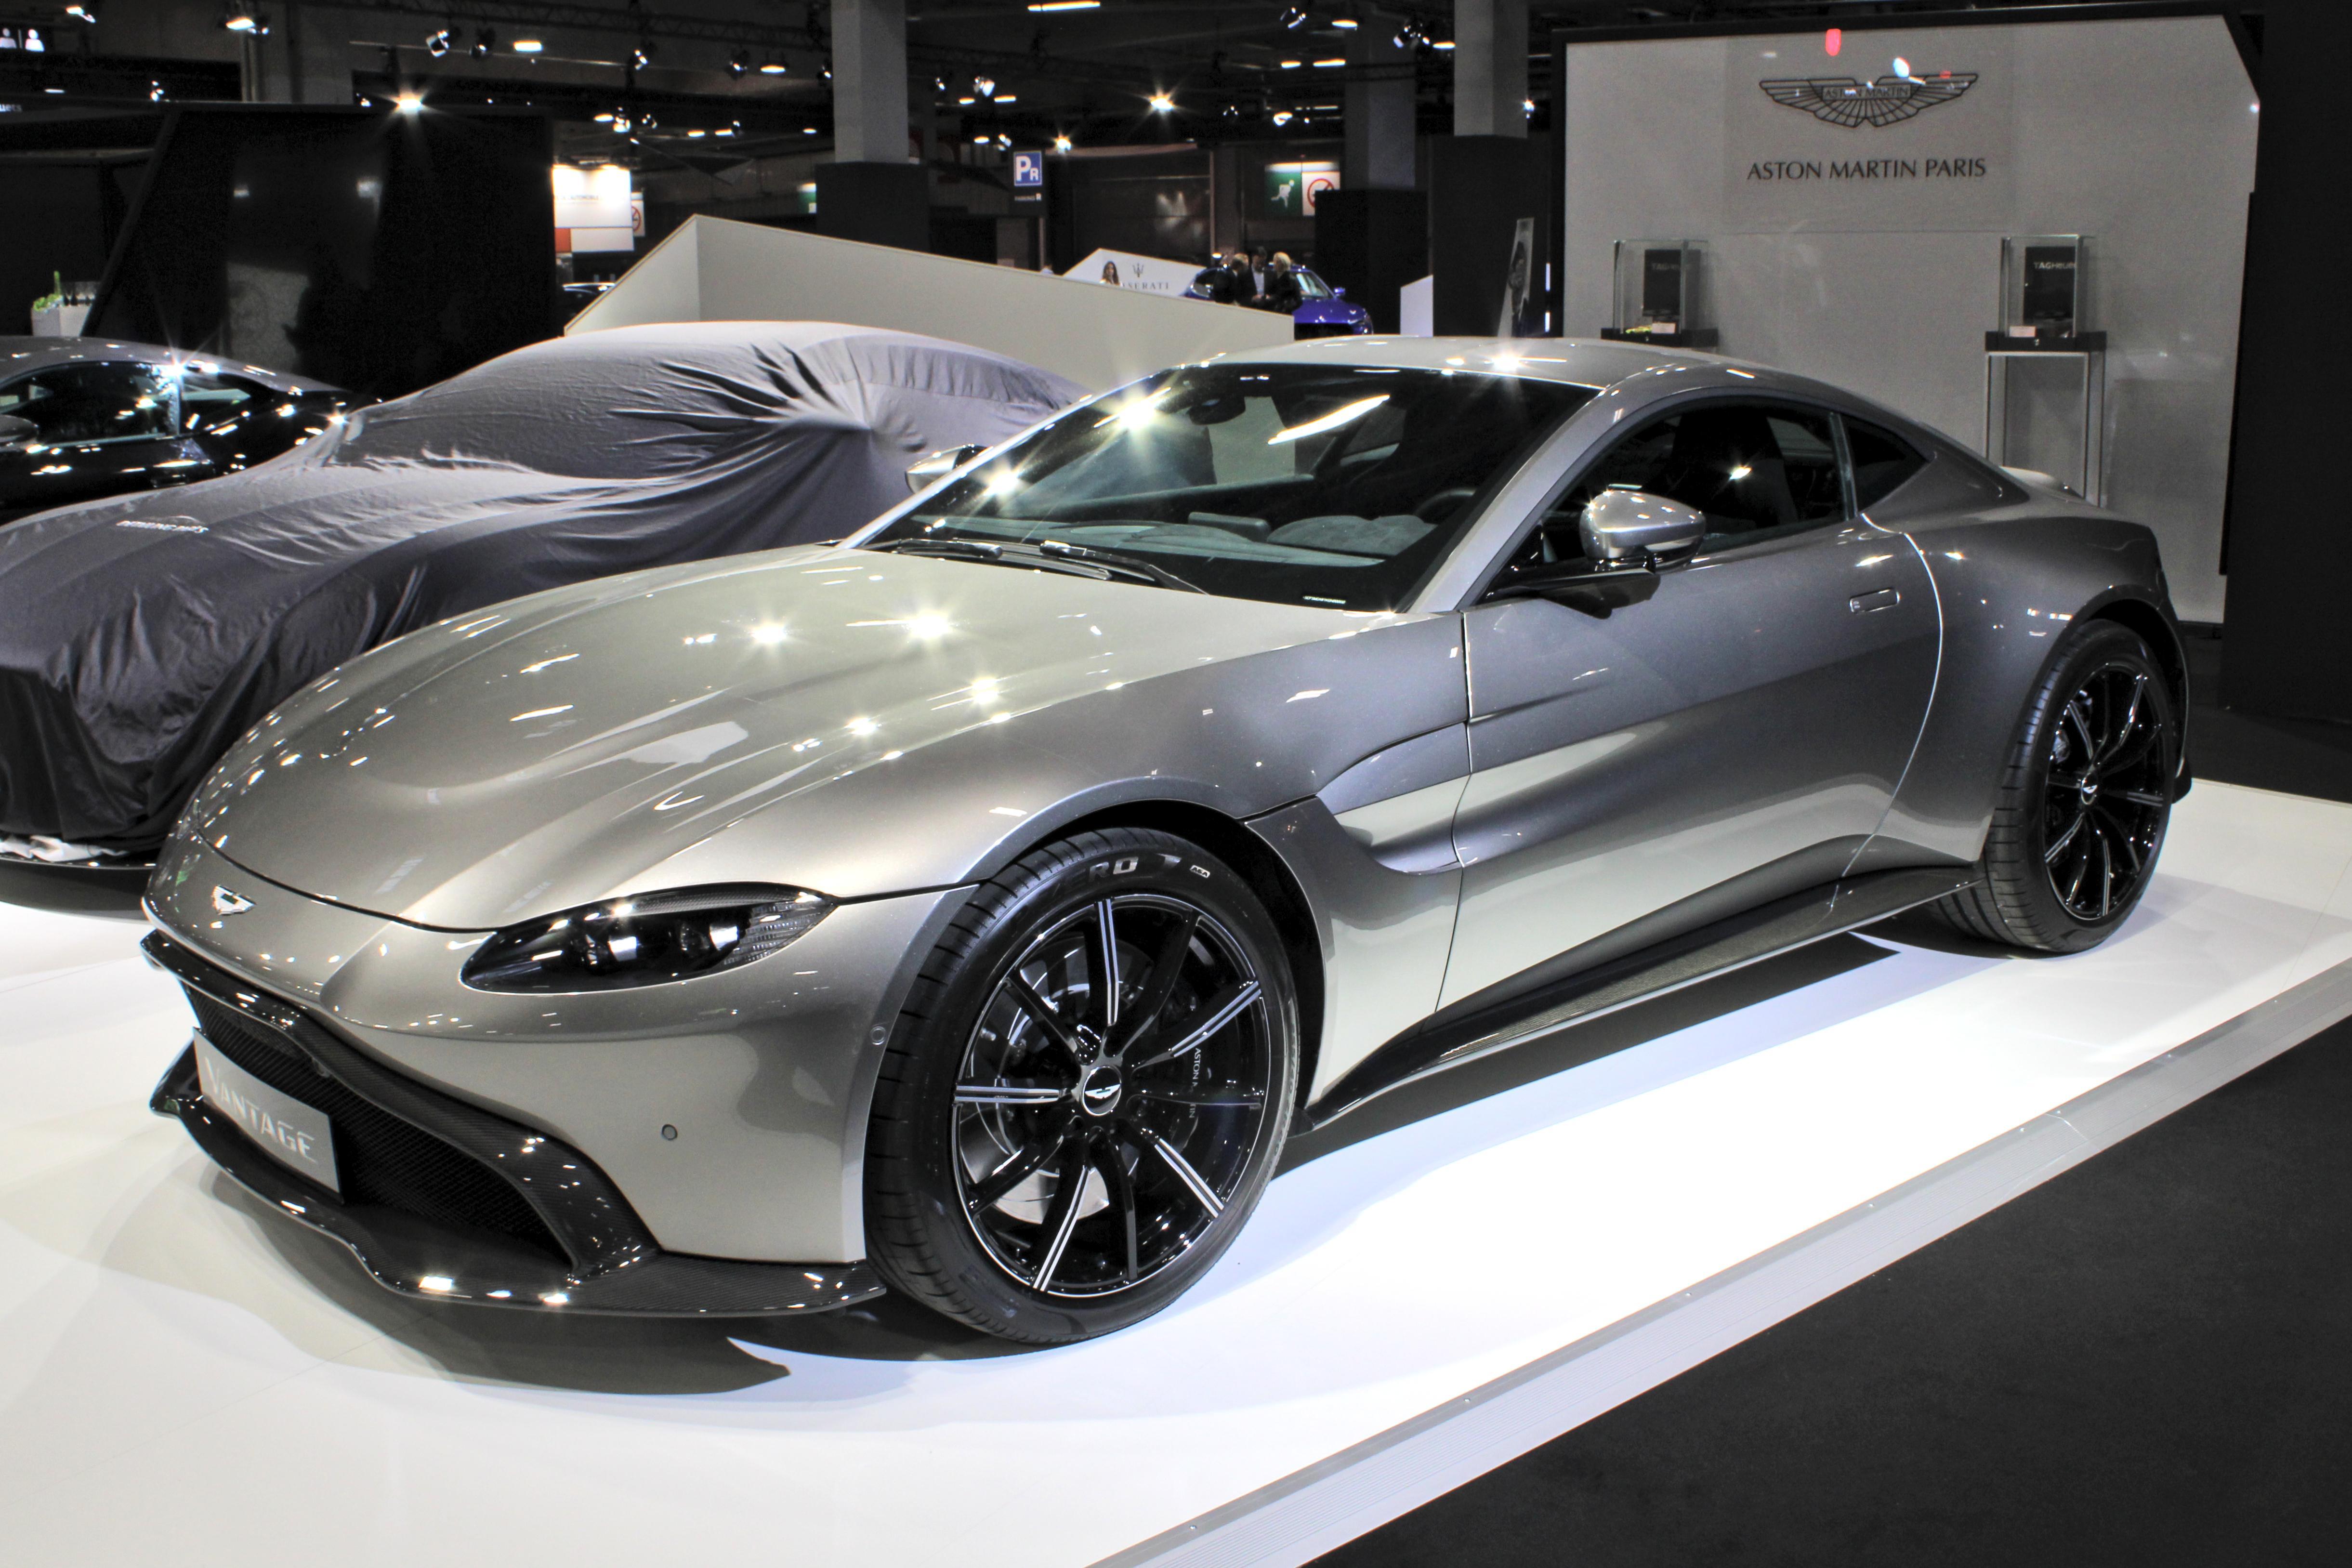 Aston Martin's Share In Free Fall. Fundamentals To Blame